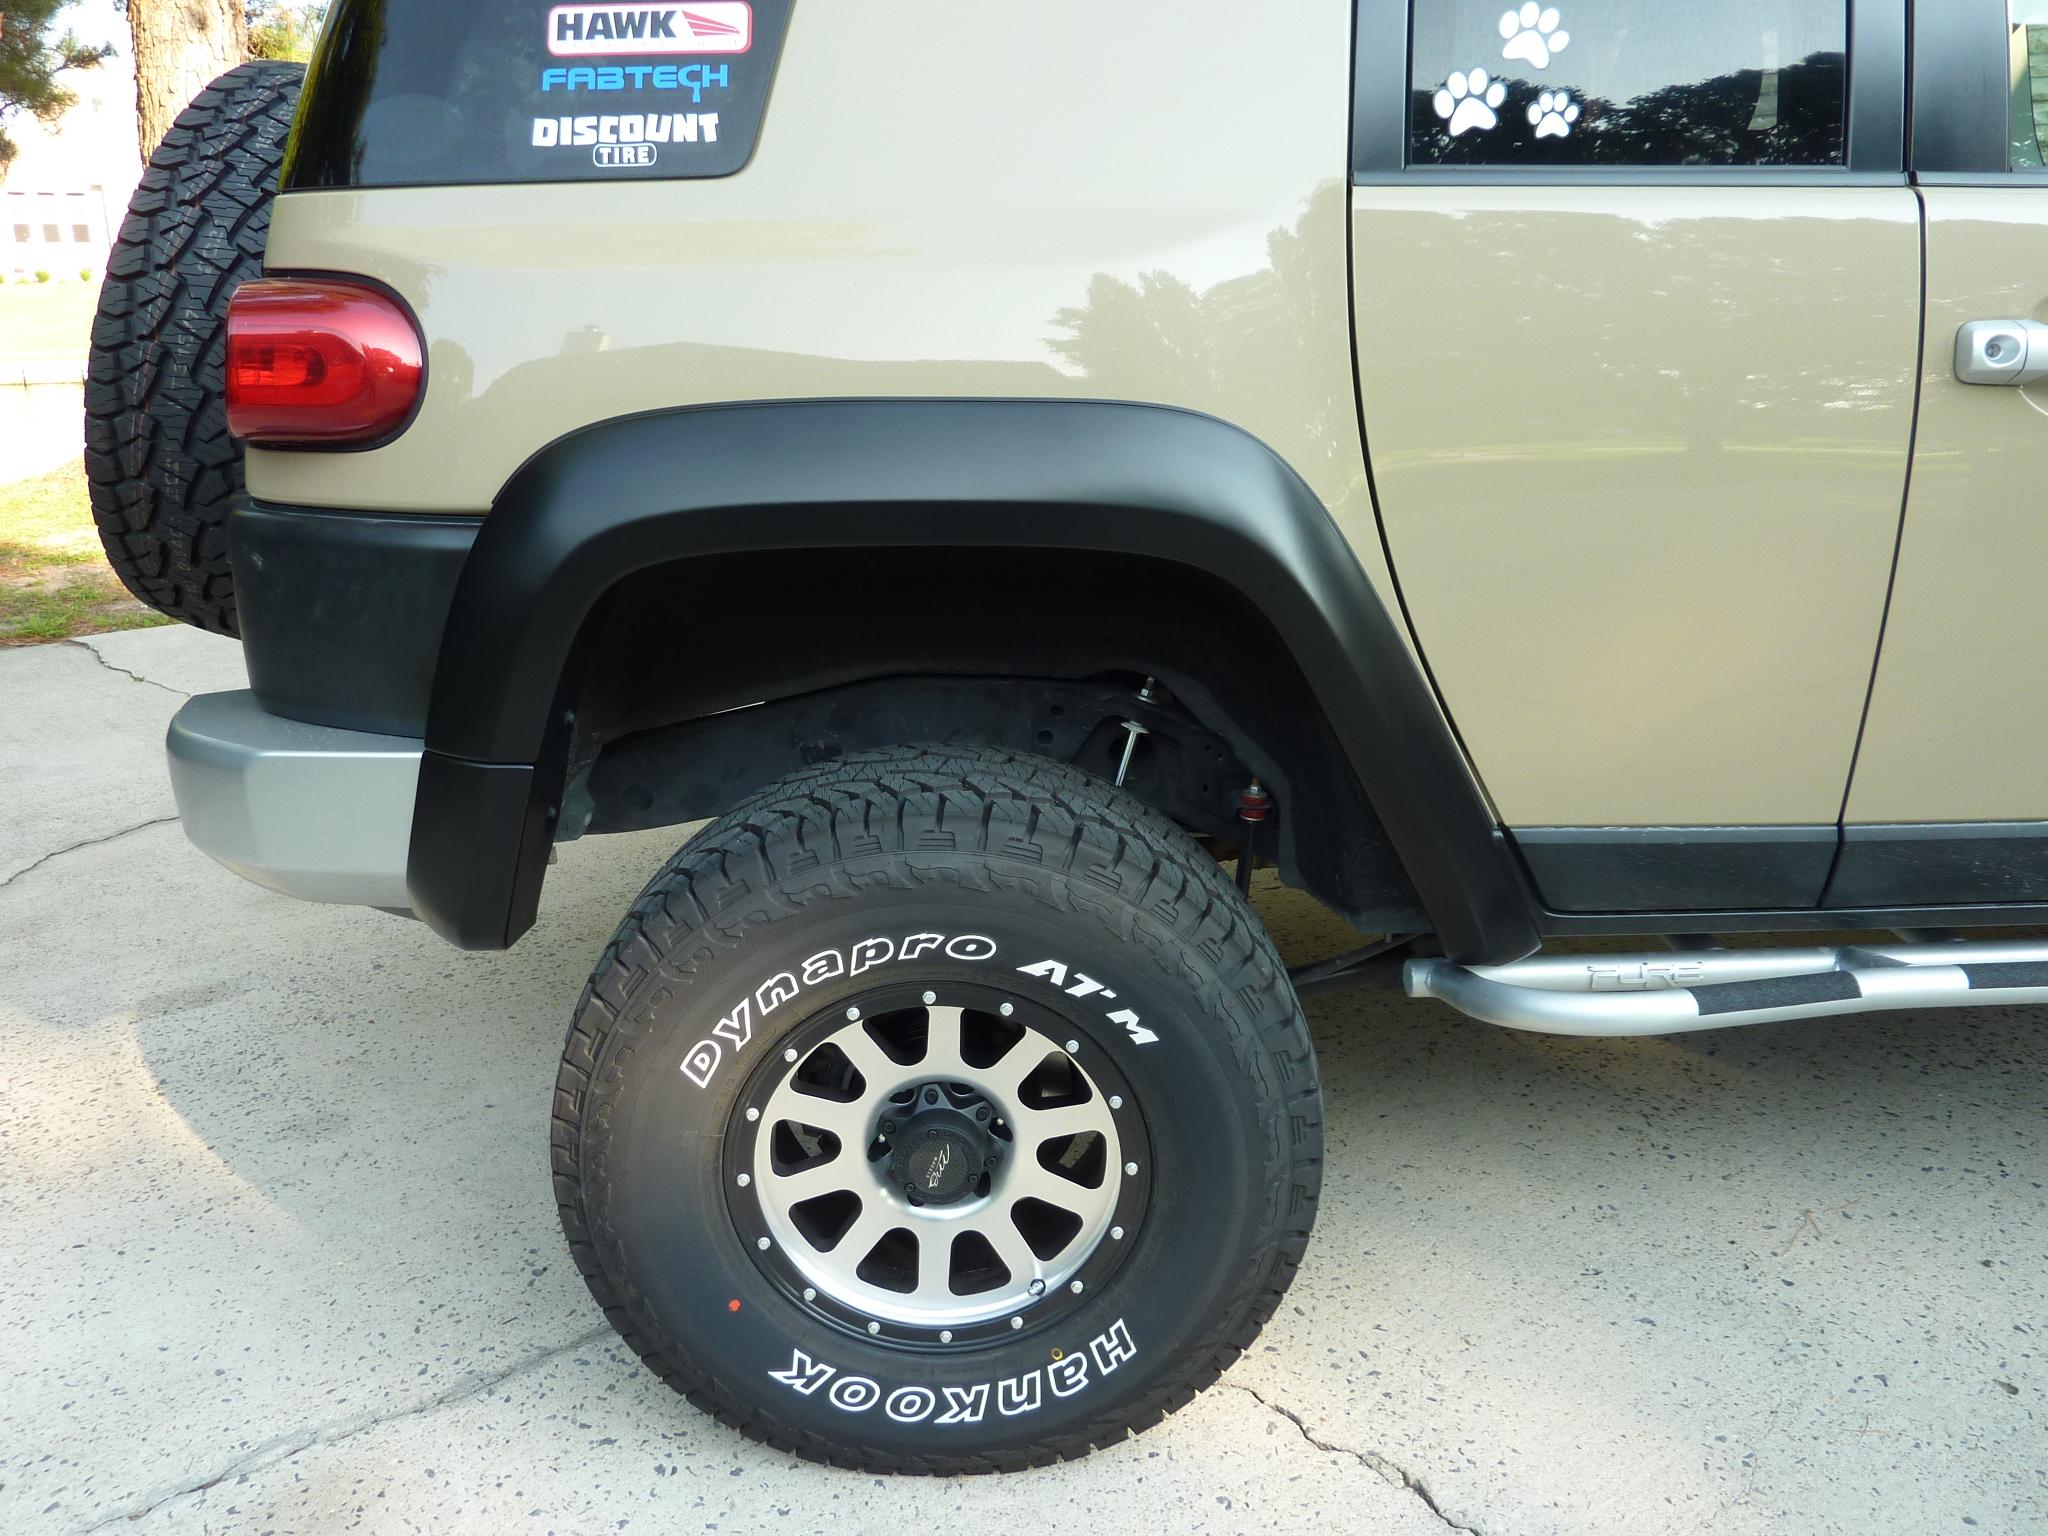 Nissan Murano Tire Size U003eu003e My Hankook Dynapro ATM RF_10 LT Series Review    Page